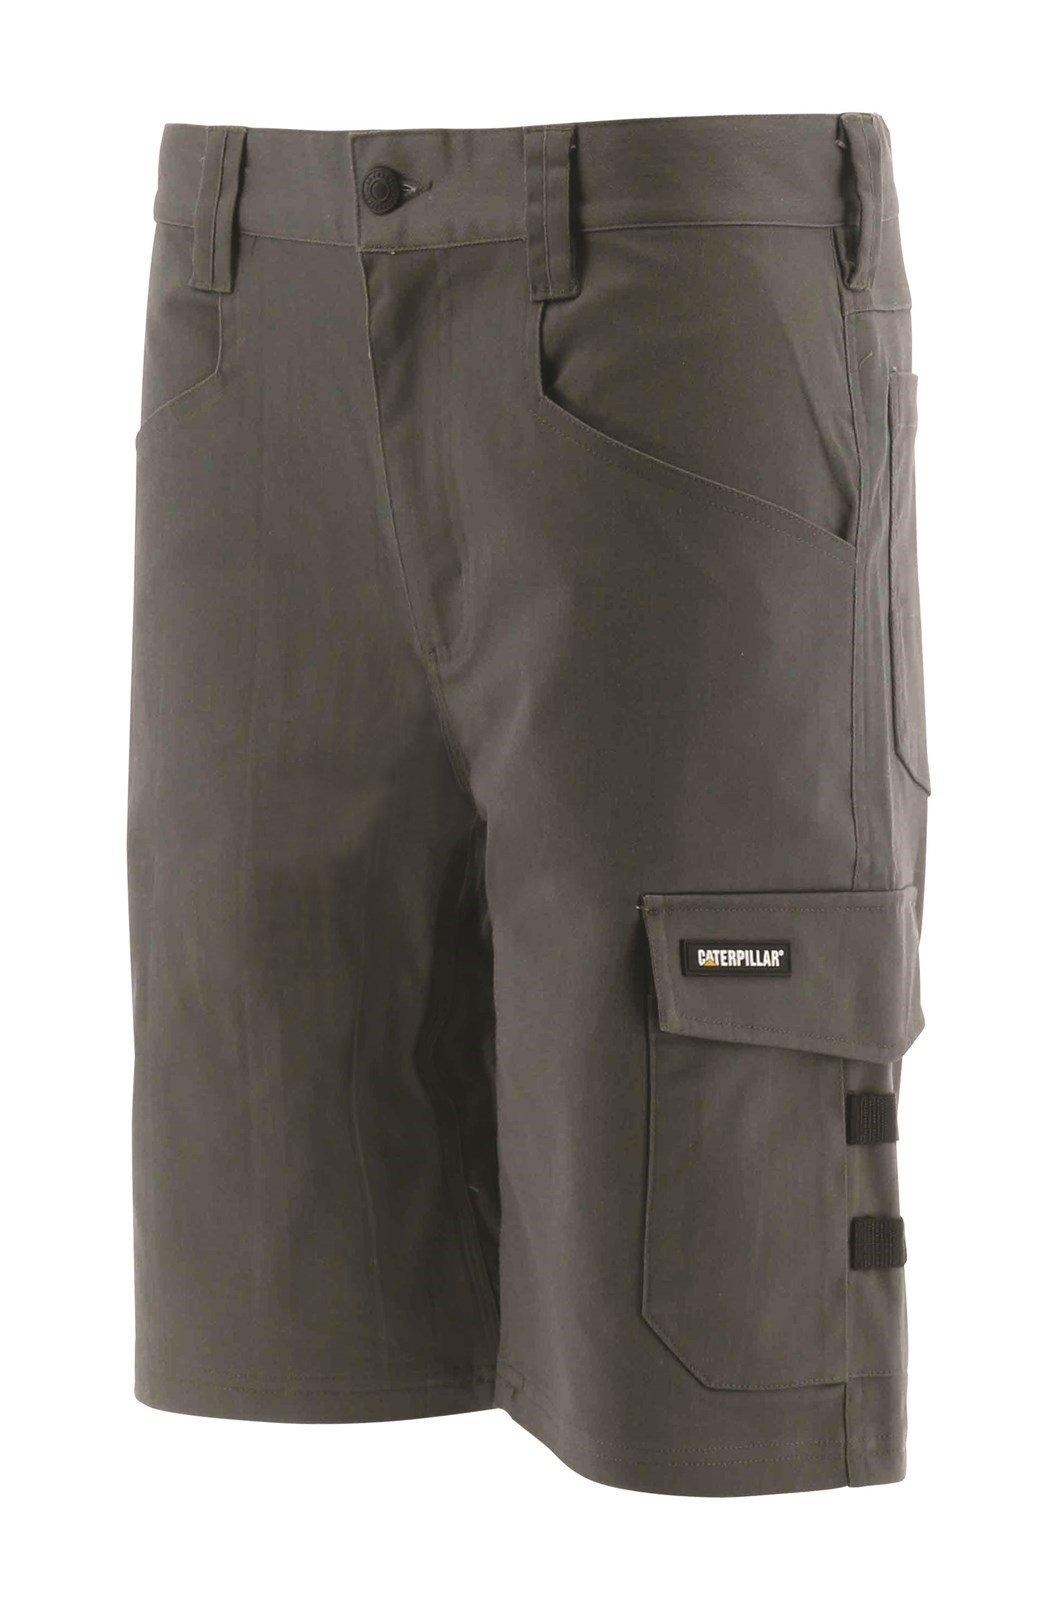 "Caterpillar Unisex Tracker Shorts Black 32224 - Dark Shadow 30"""